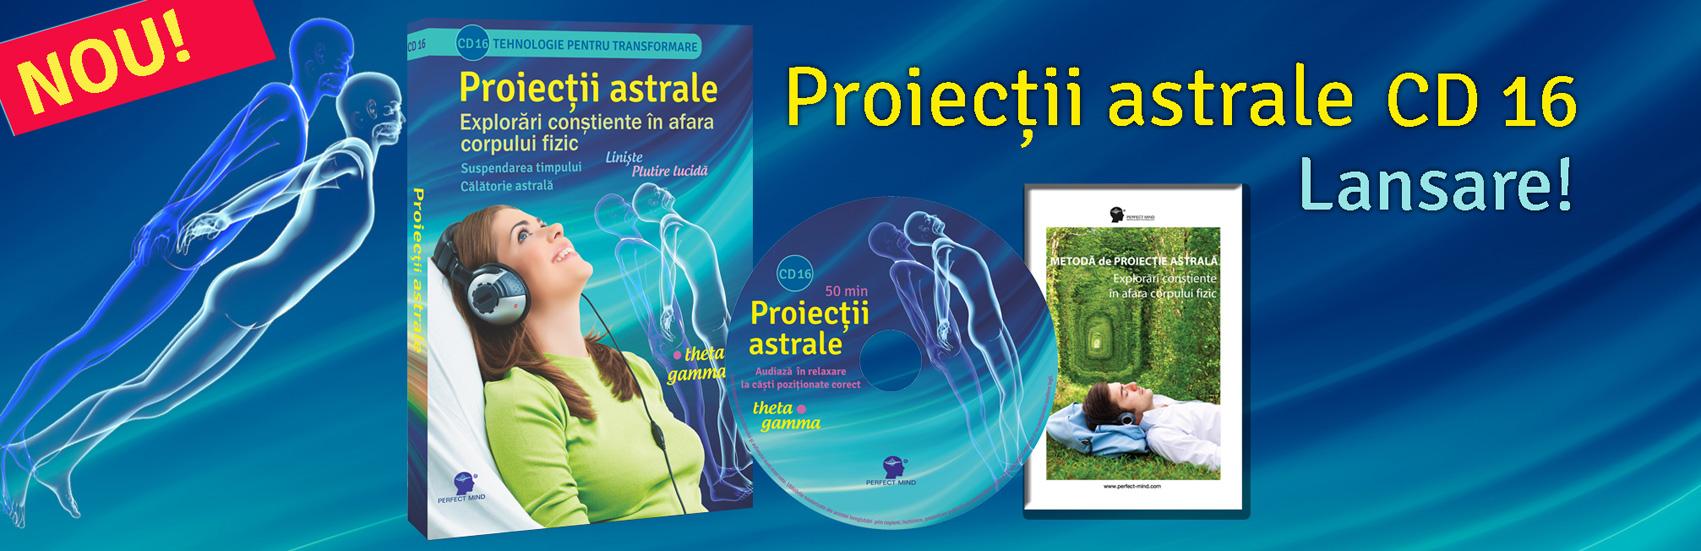 Proiectii astrale program